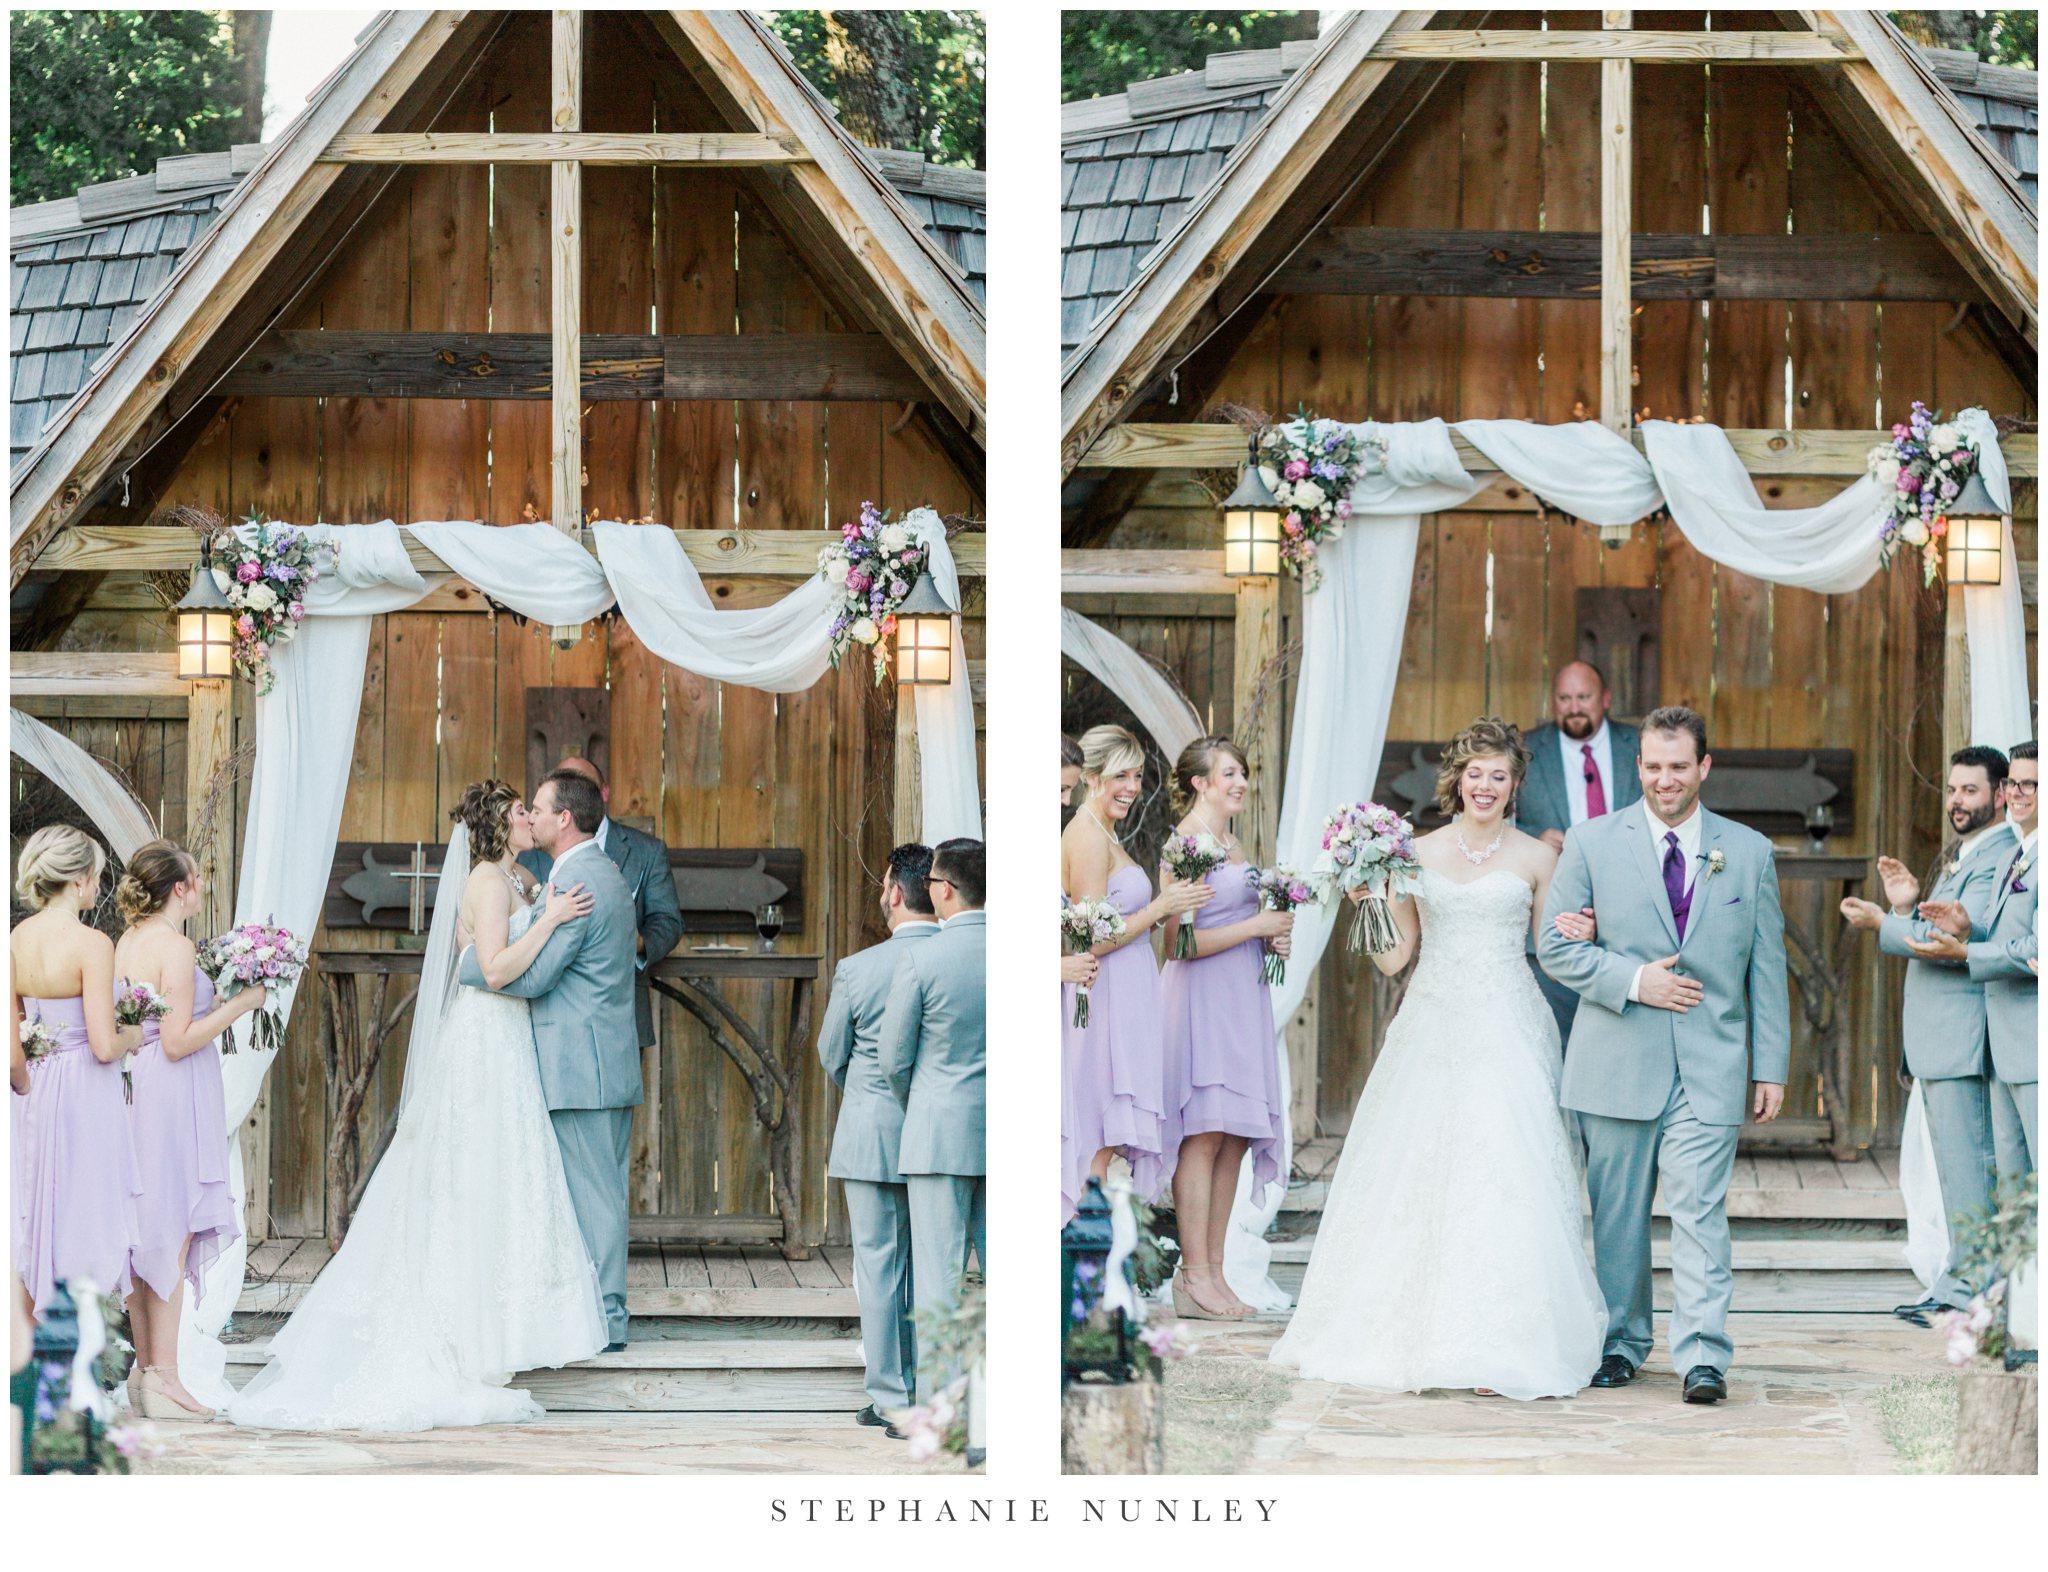 southern-classy-outdoor-barn-wedding-photos-0085.jpg